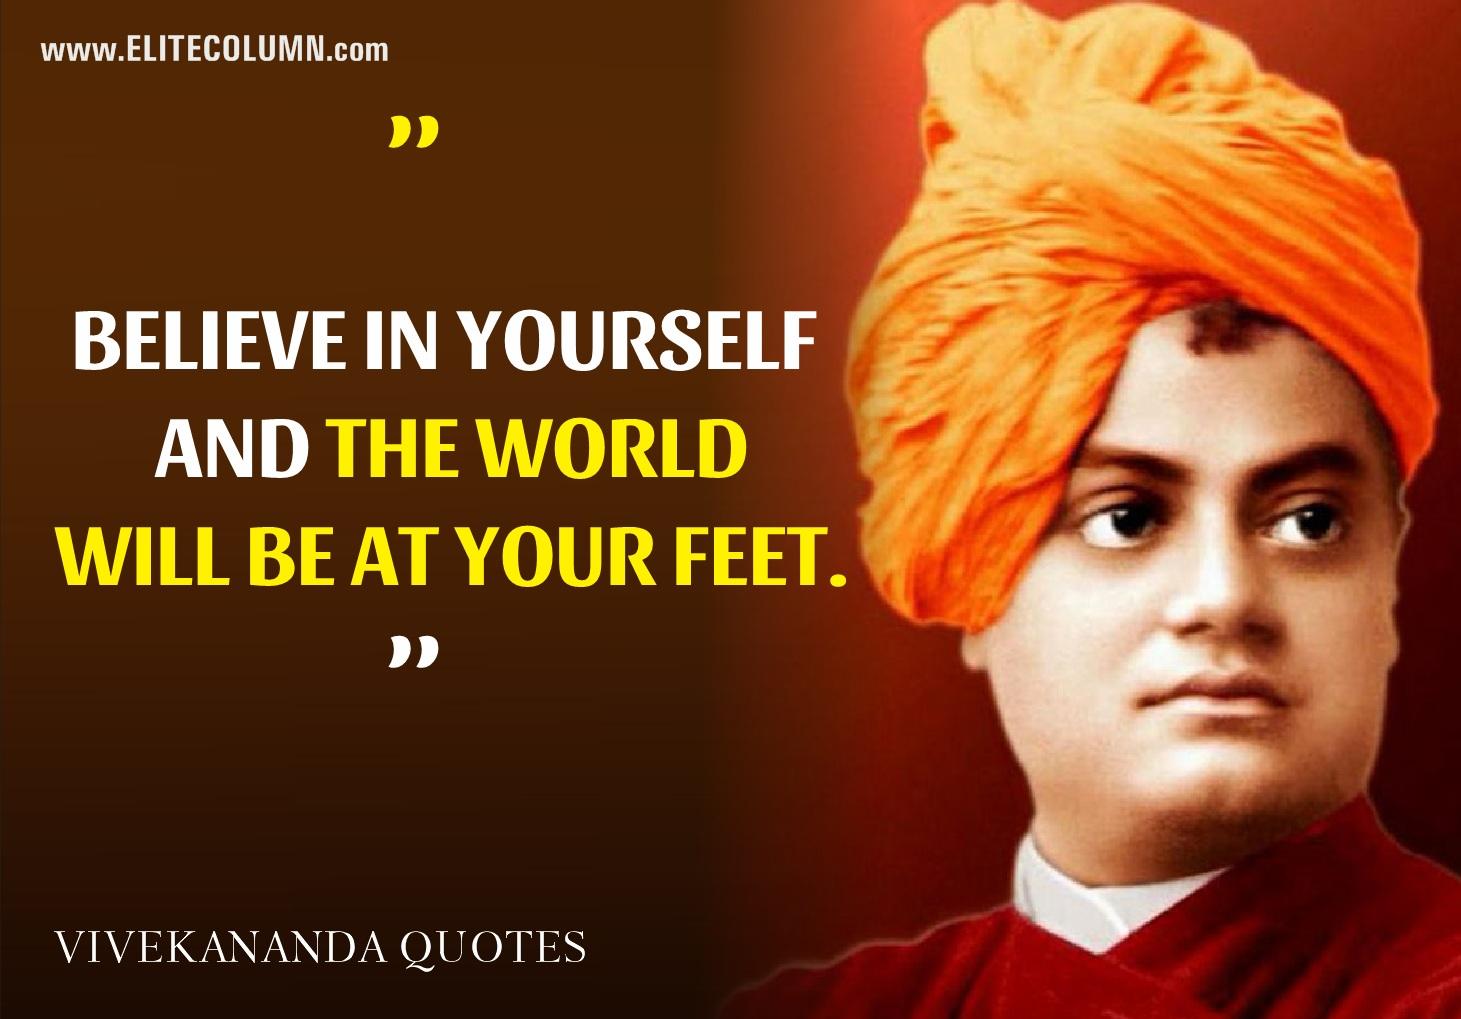 Vivekananda Quotes (7)